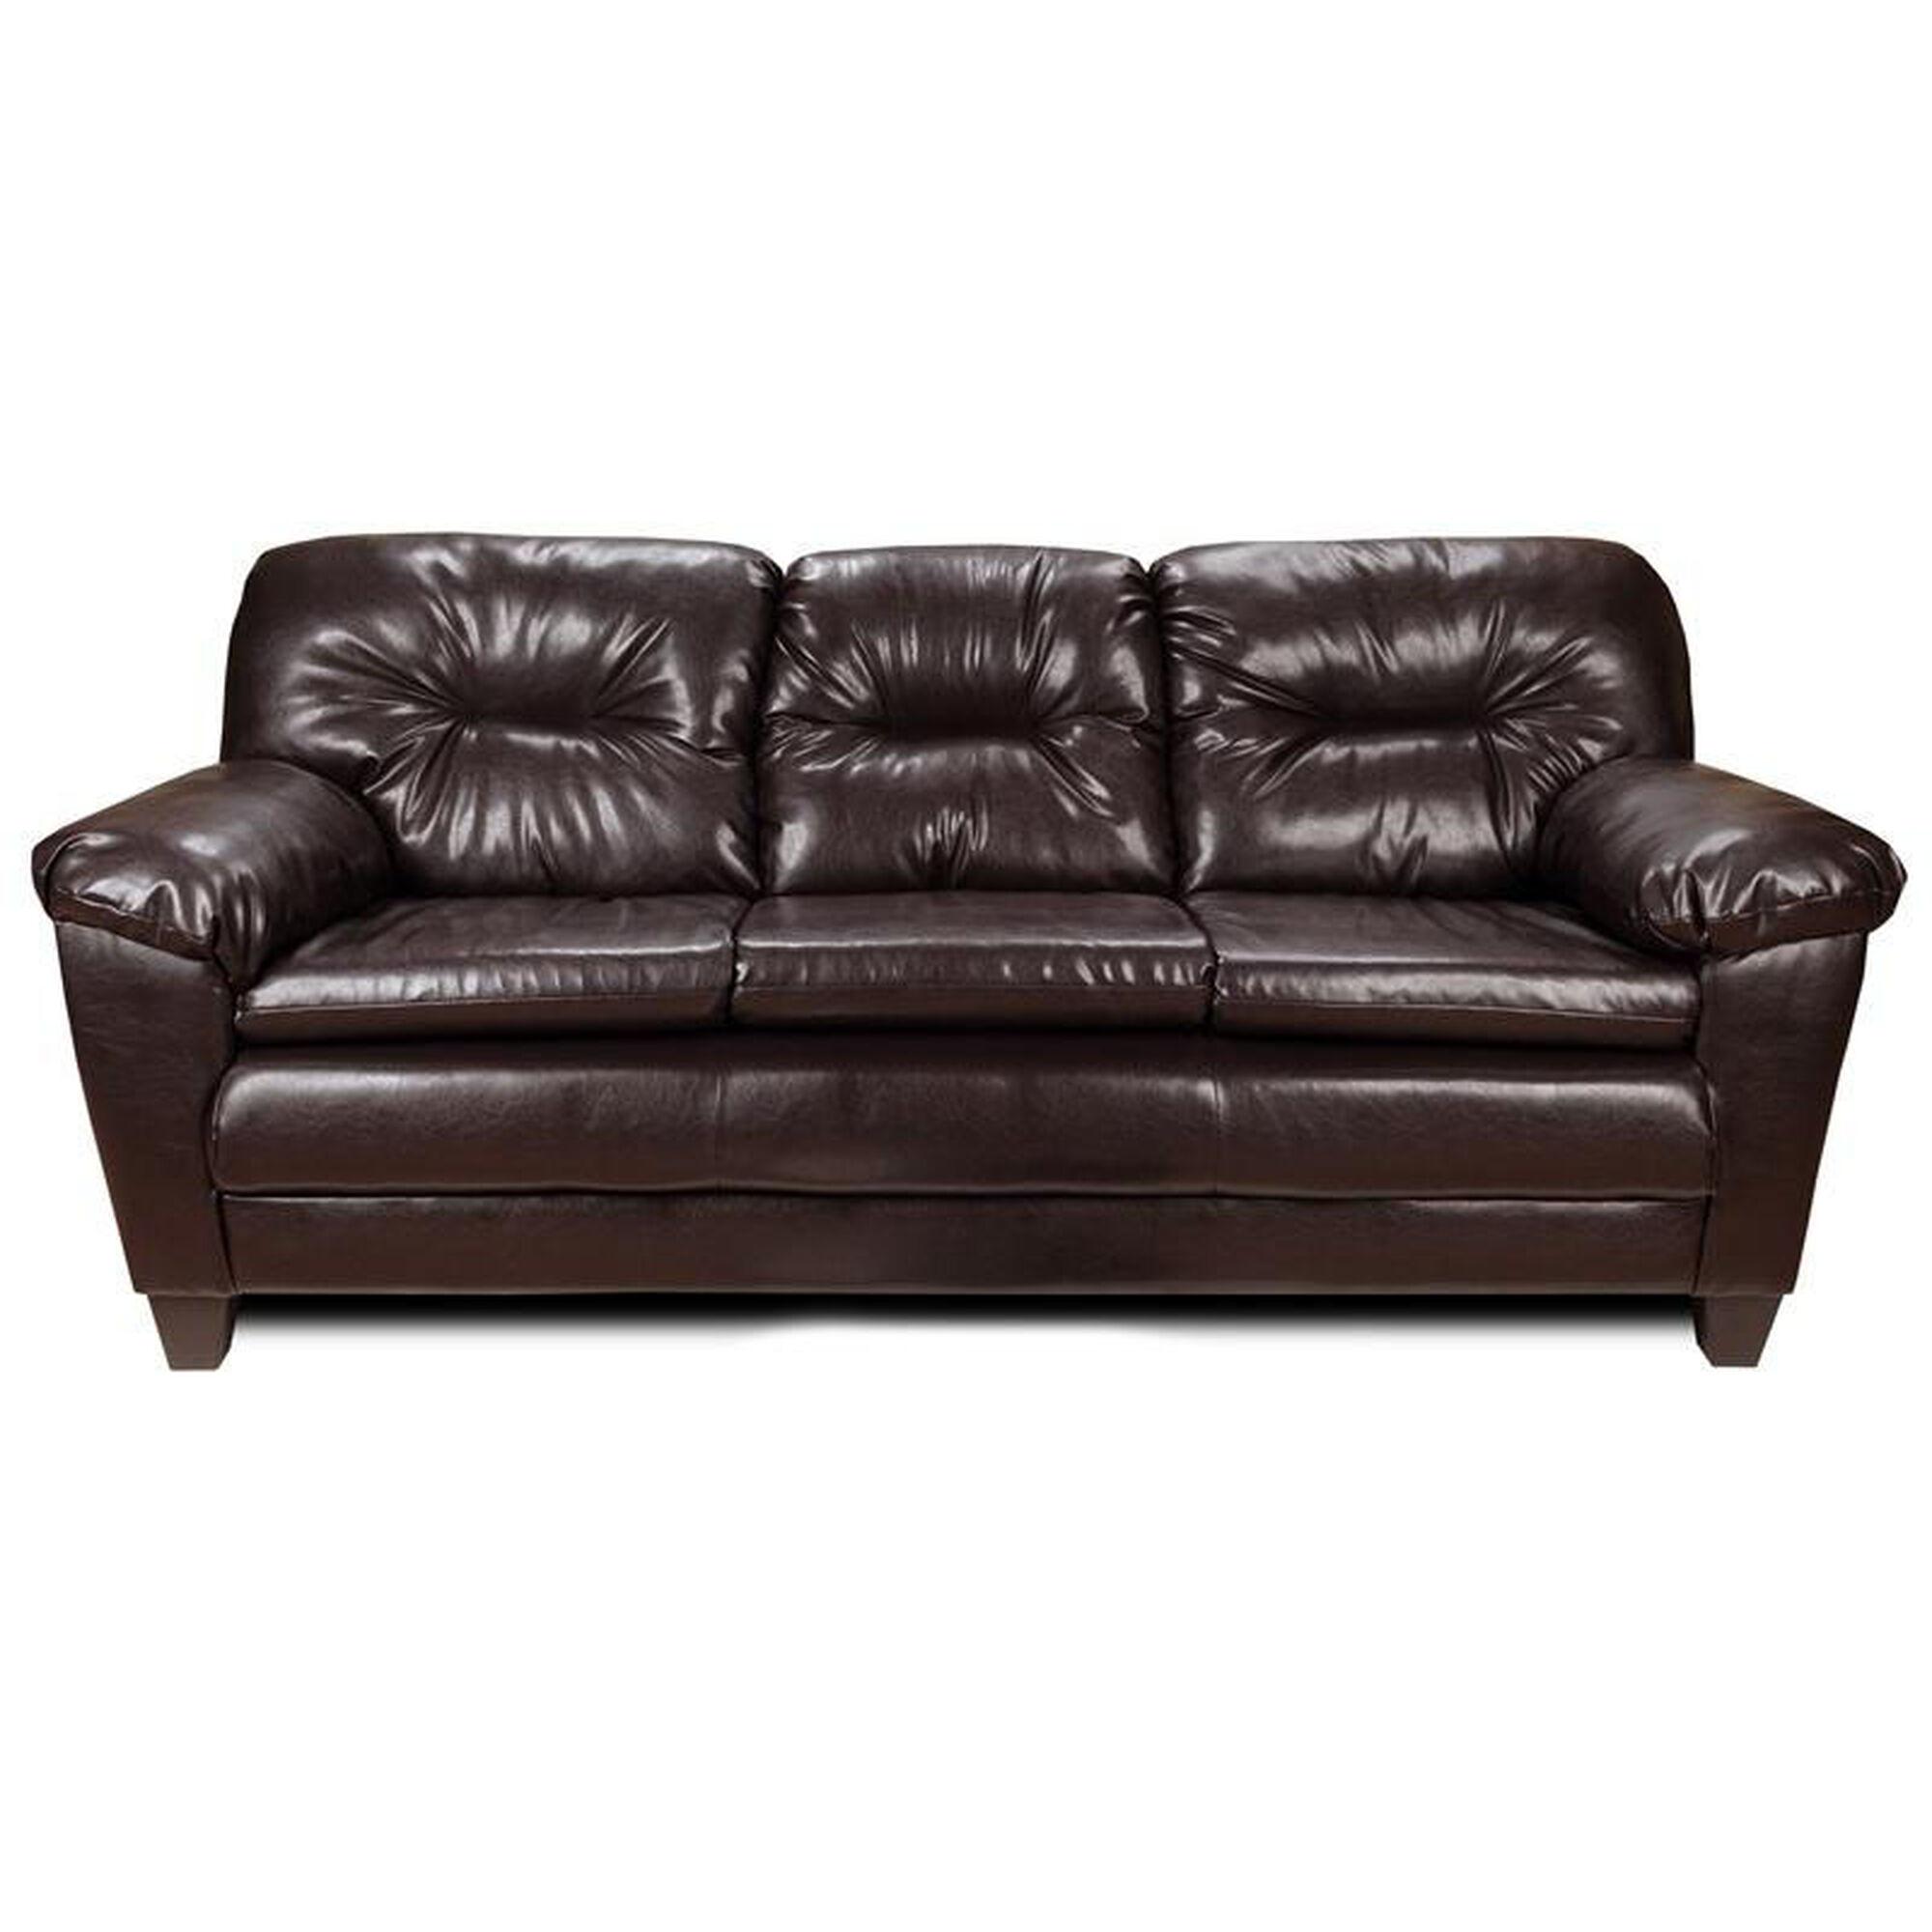 Sofa denver mocha 29301 s dm for Home furniture sites